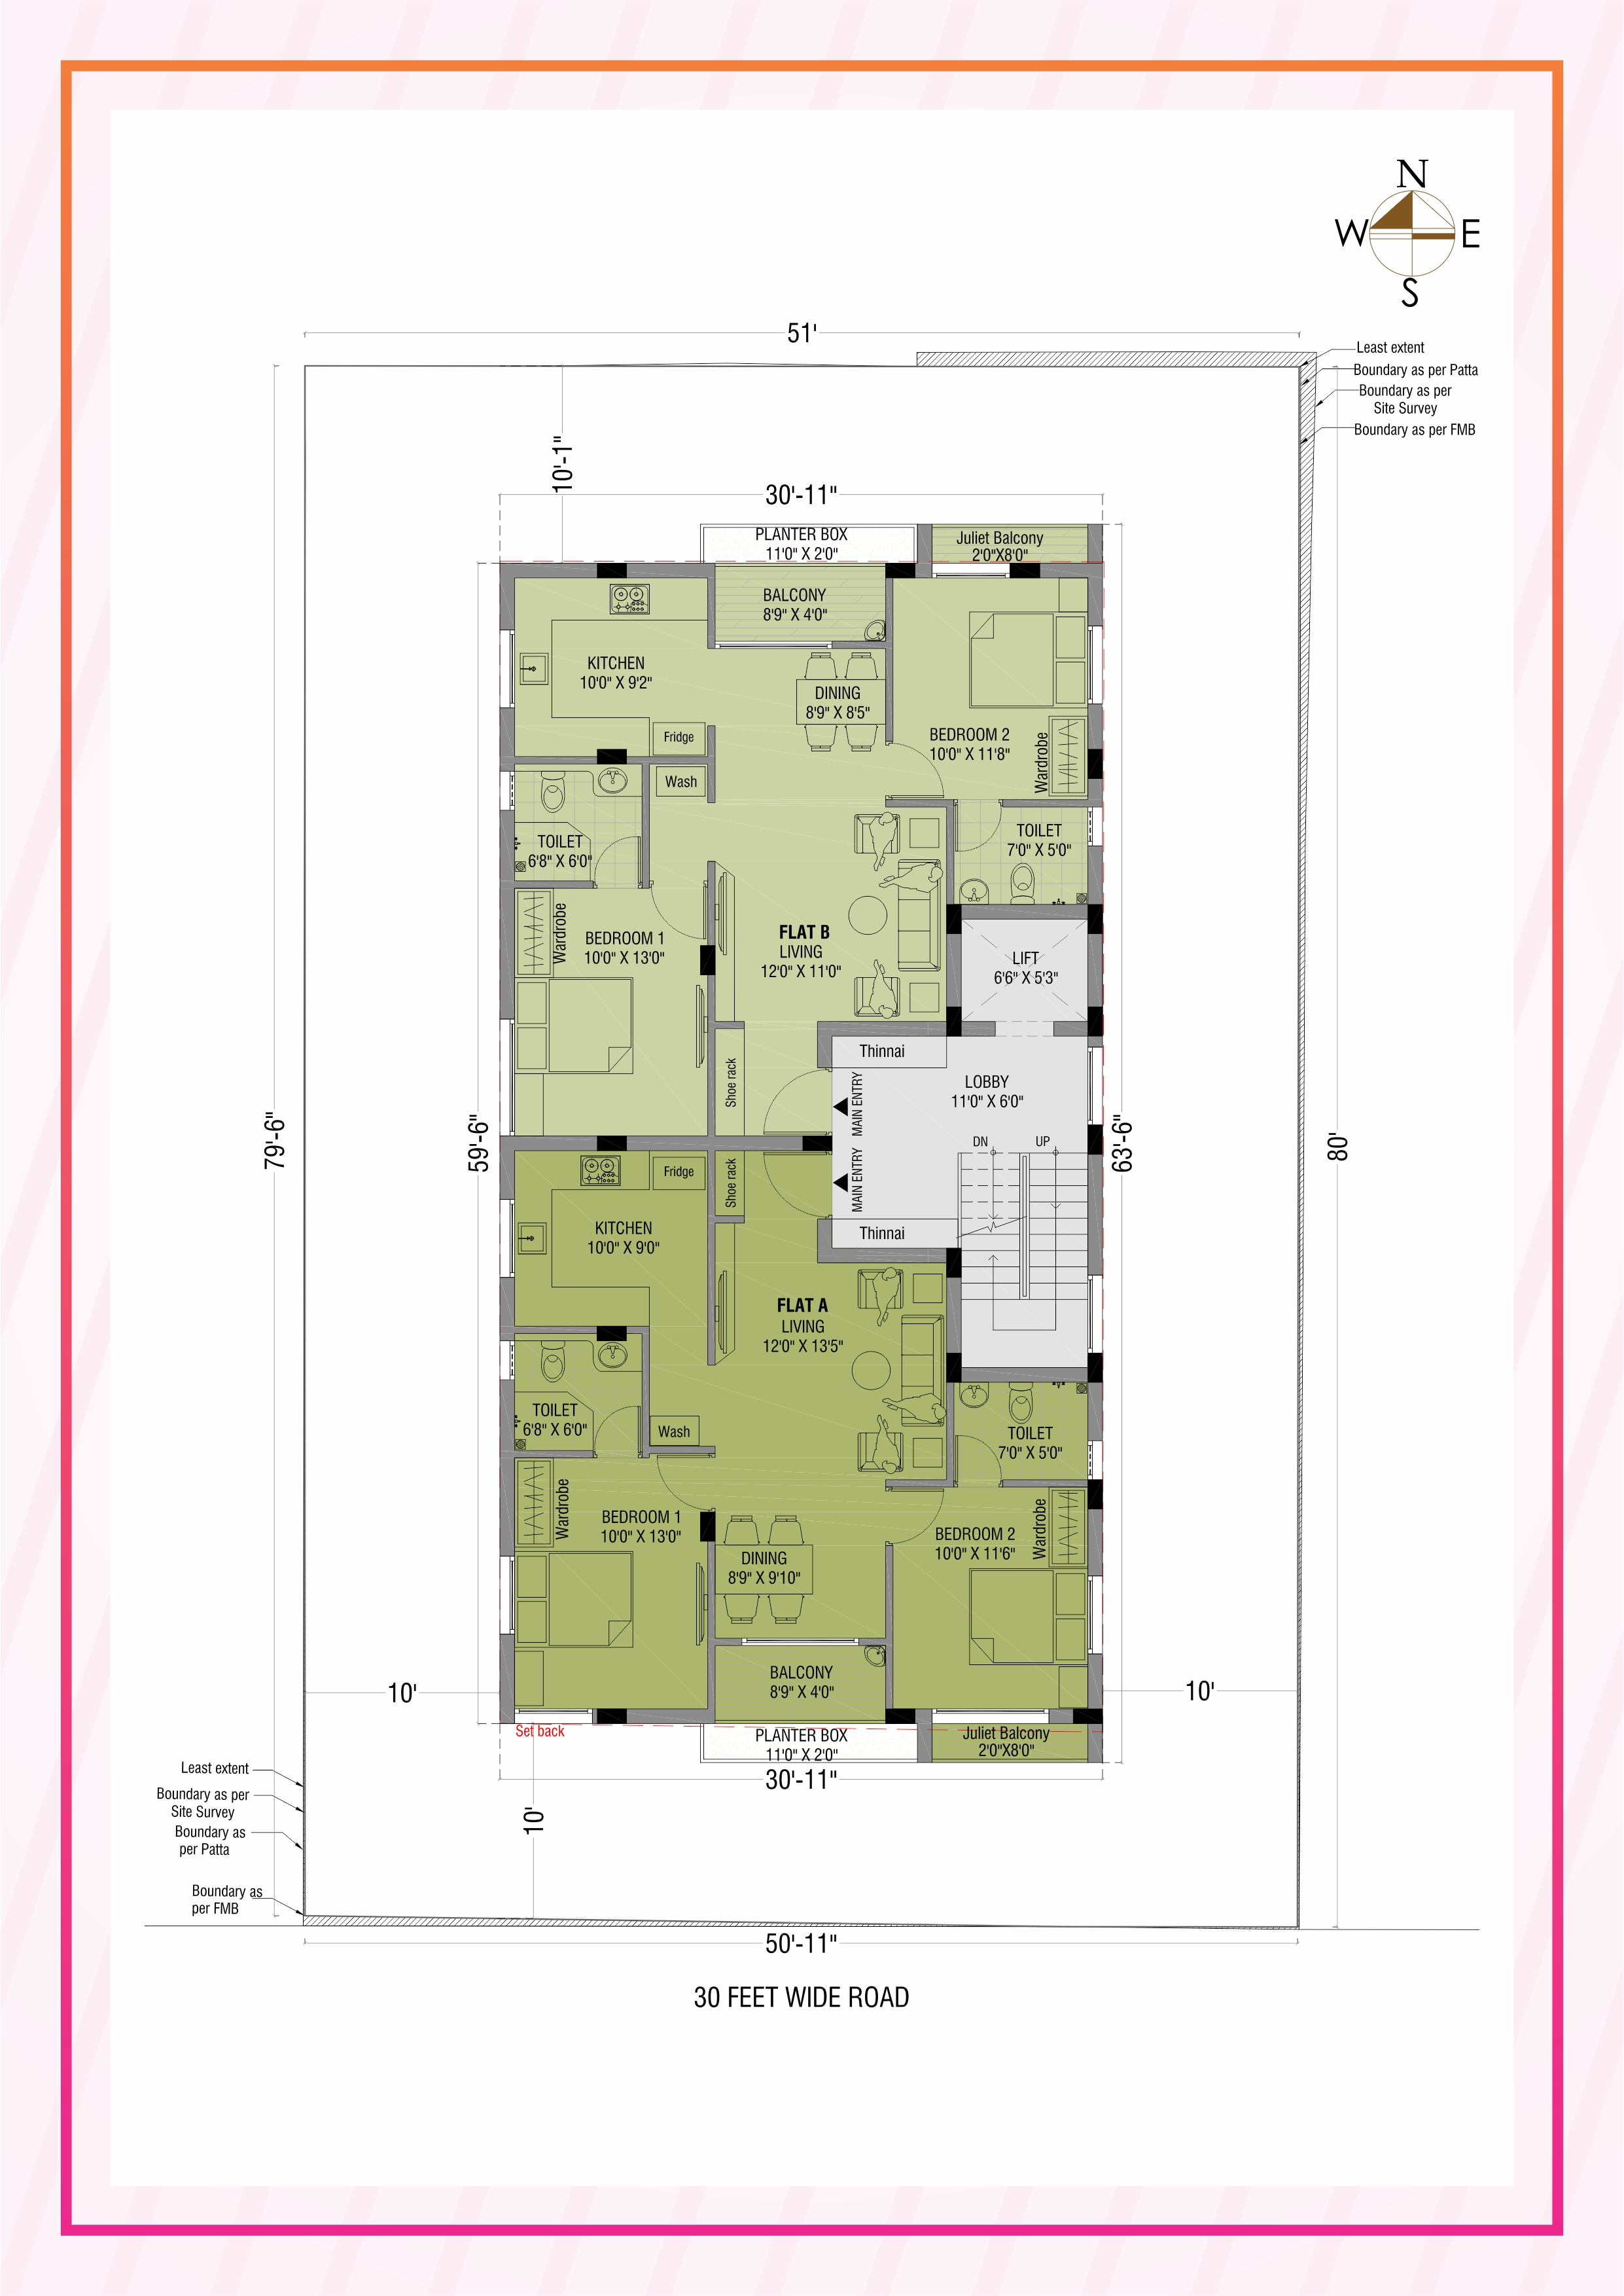 https://firmfoundations.in/projects/floorplans/thumbnails/15948115087Q_50_PLAN.jpg